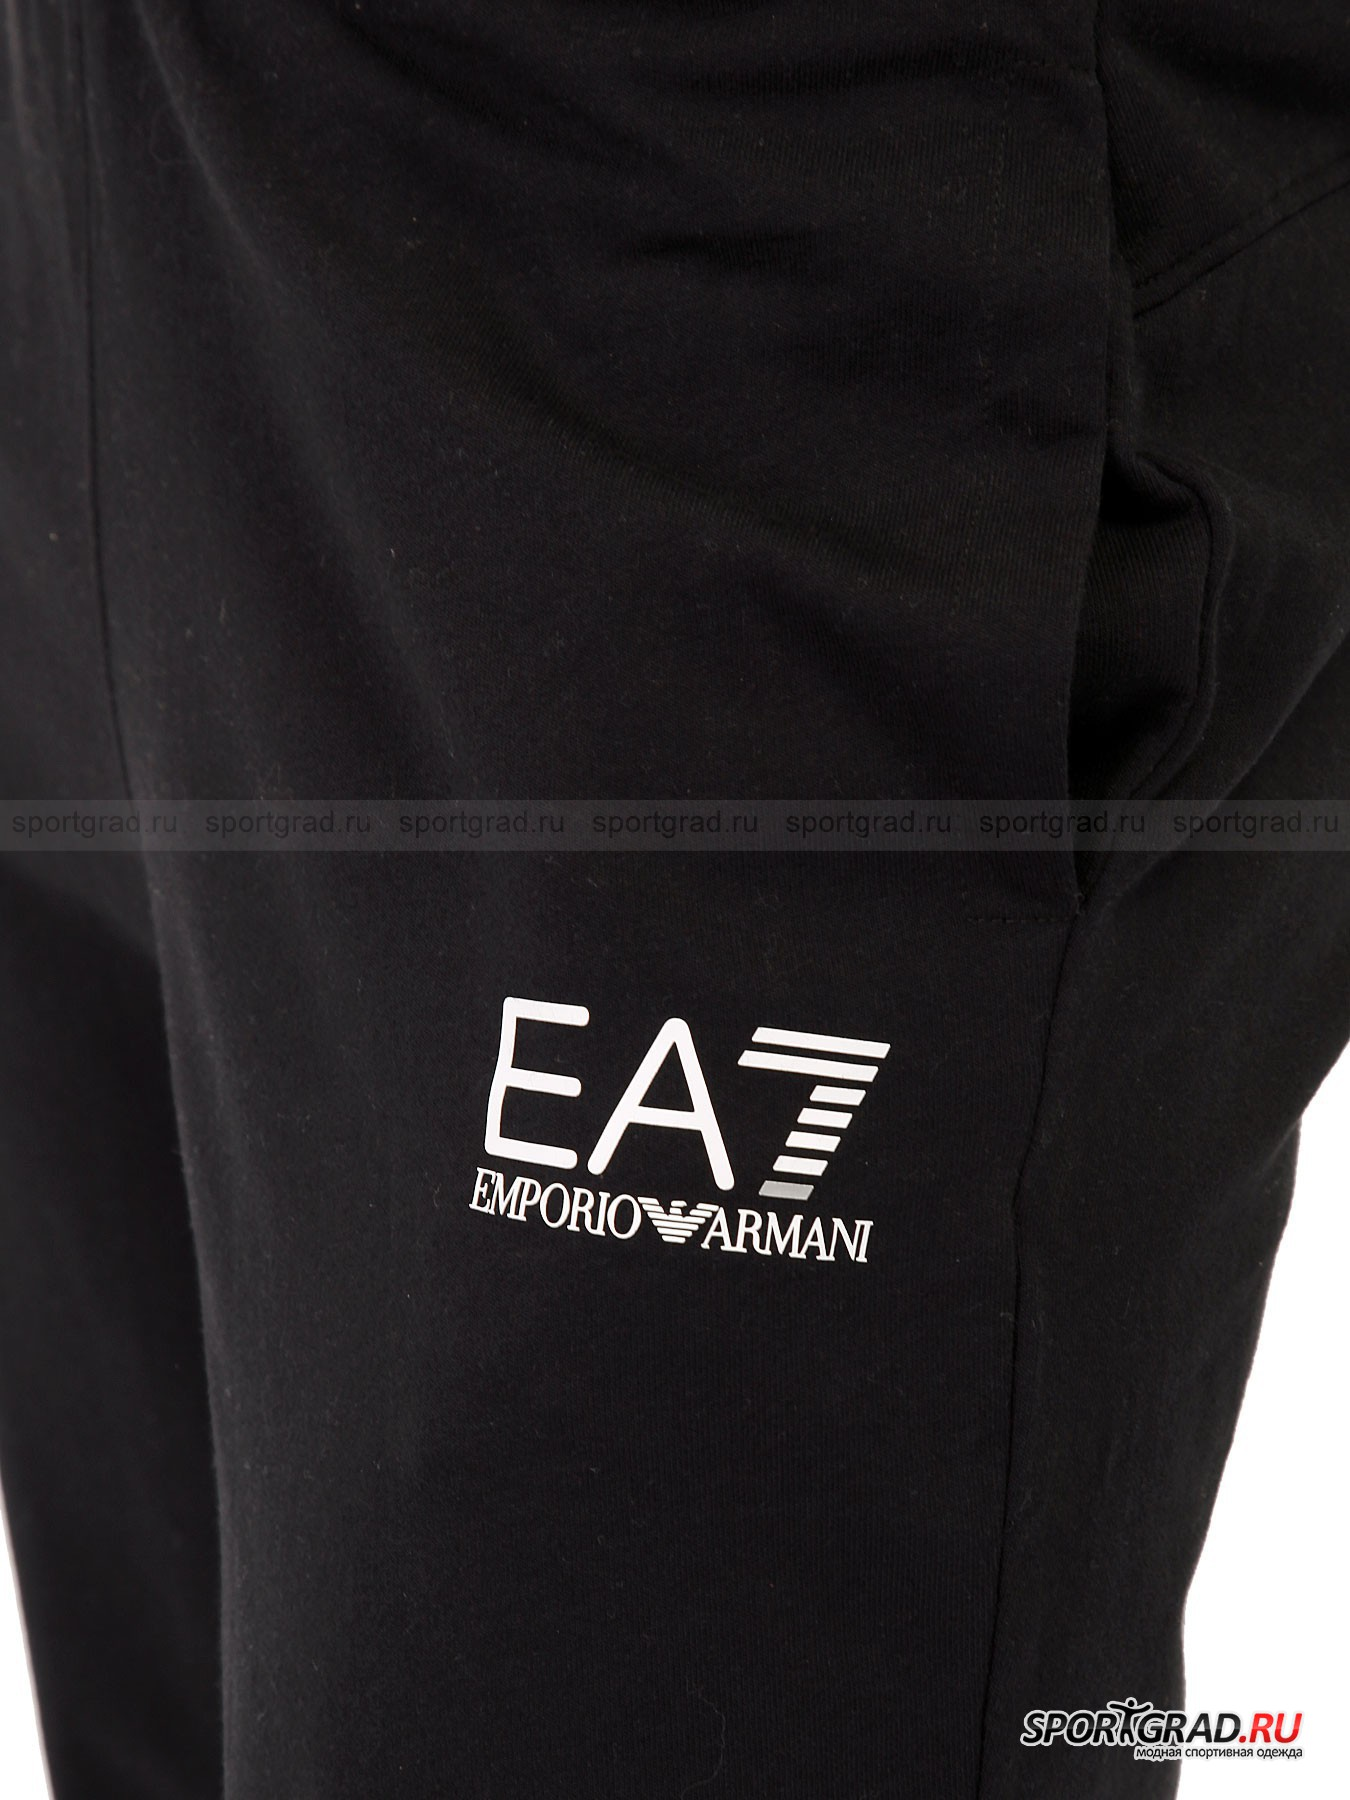 Спортивный костюм мужской Train Core ID Tracksuit EMPORIO ARMANI от Спортград